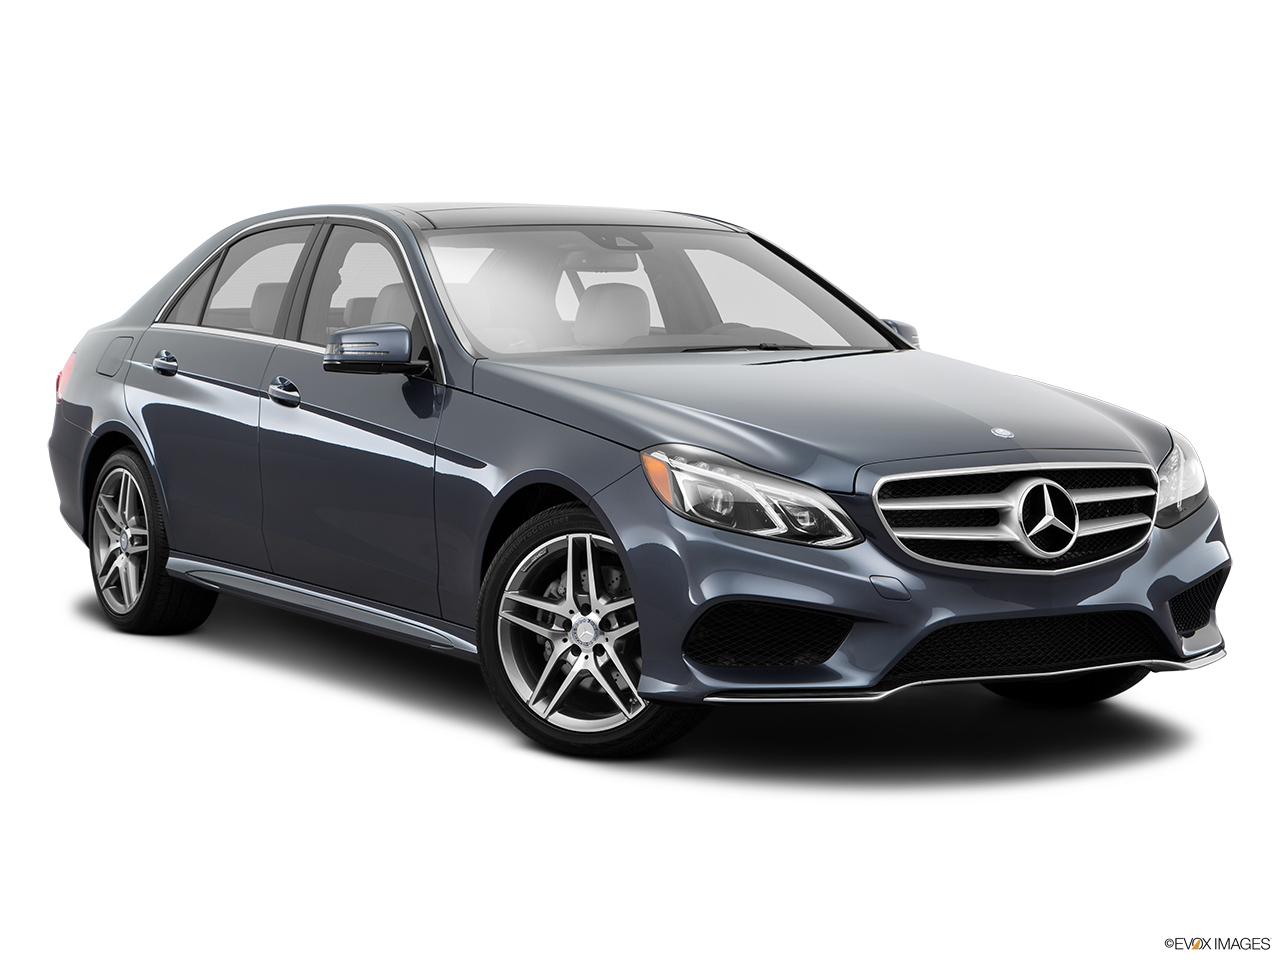 Car pictures list for mercedes benz e class saloon 2016 e for Mercedes benz payment estimator